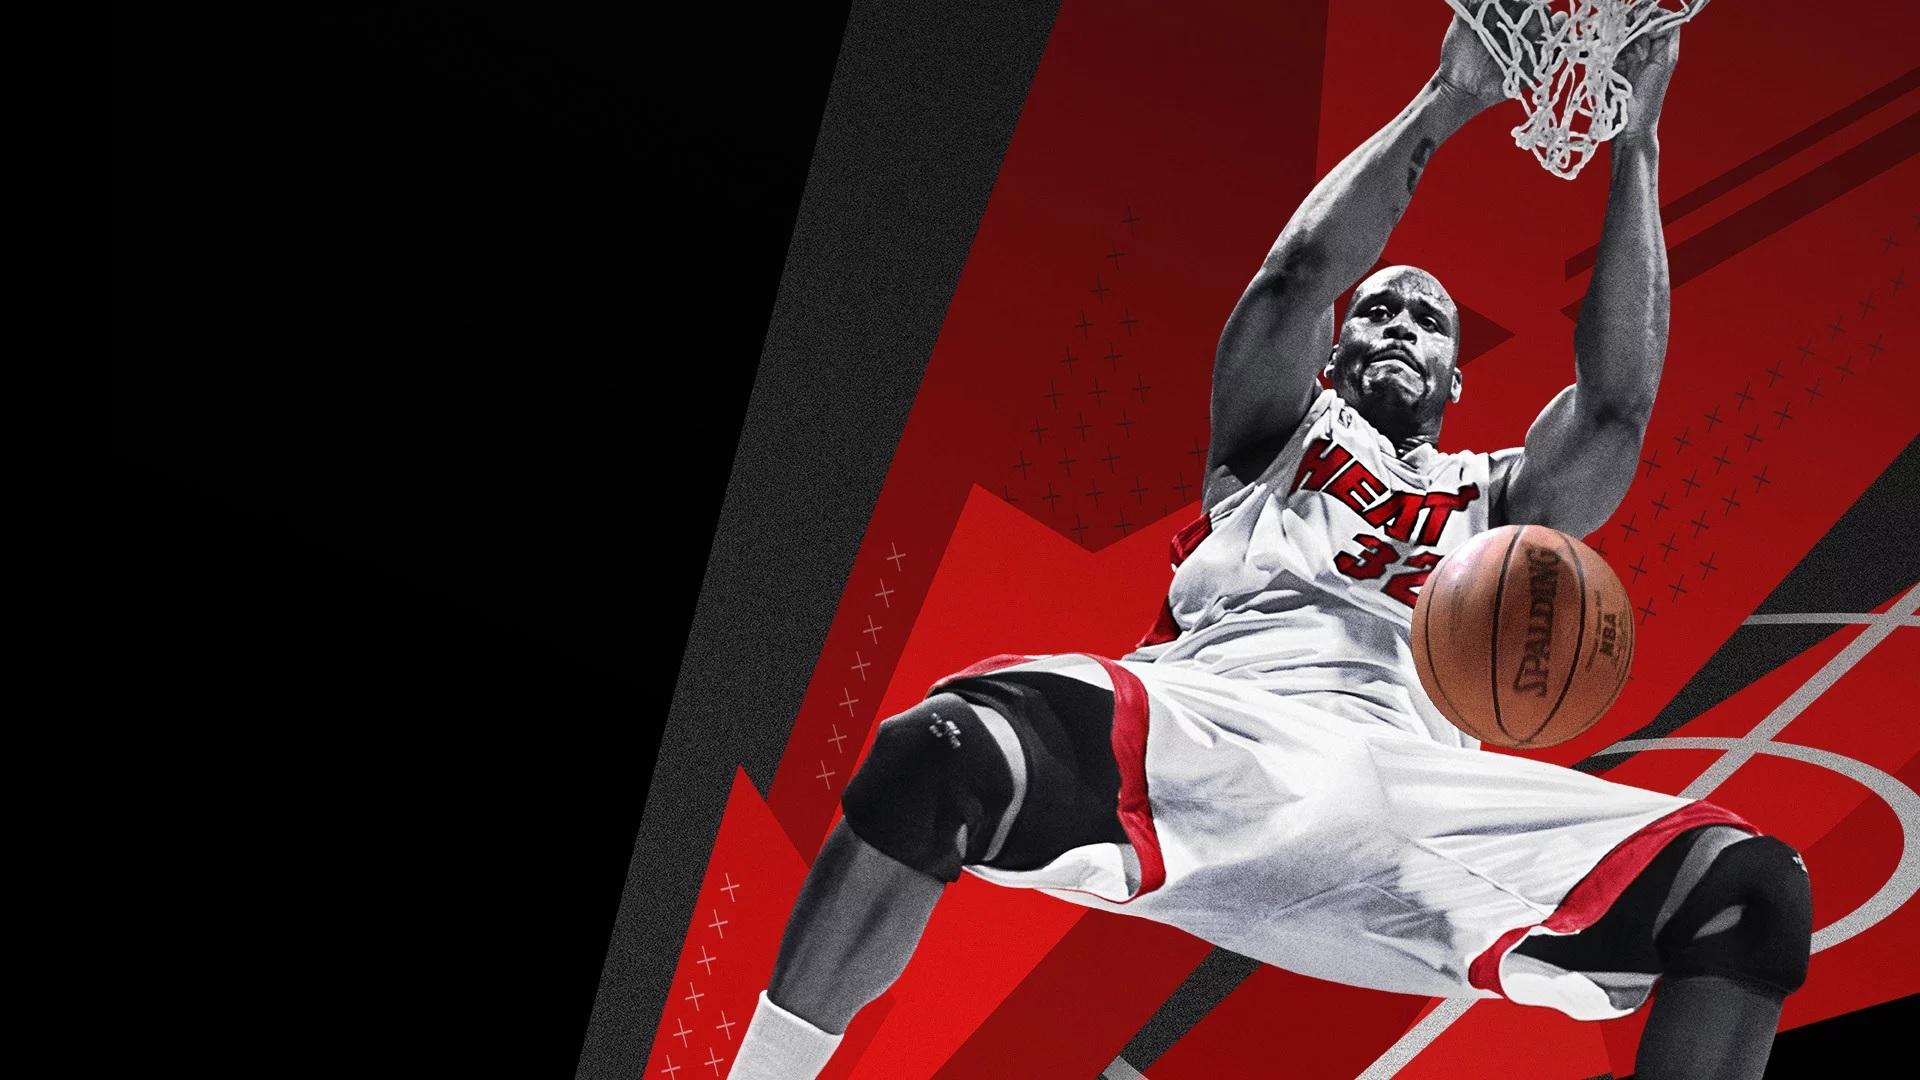 Save NBA 2K18 HD Wallpapers 1920x1080